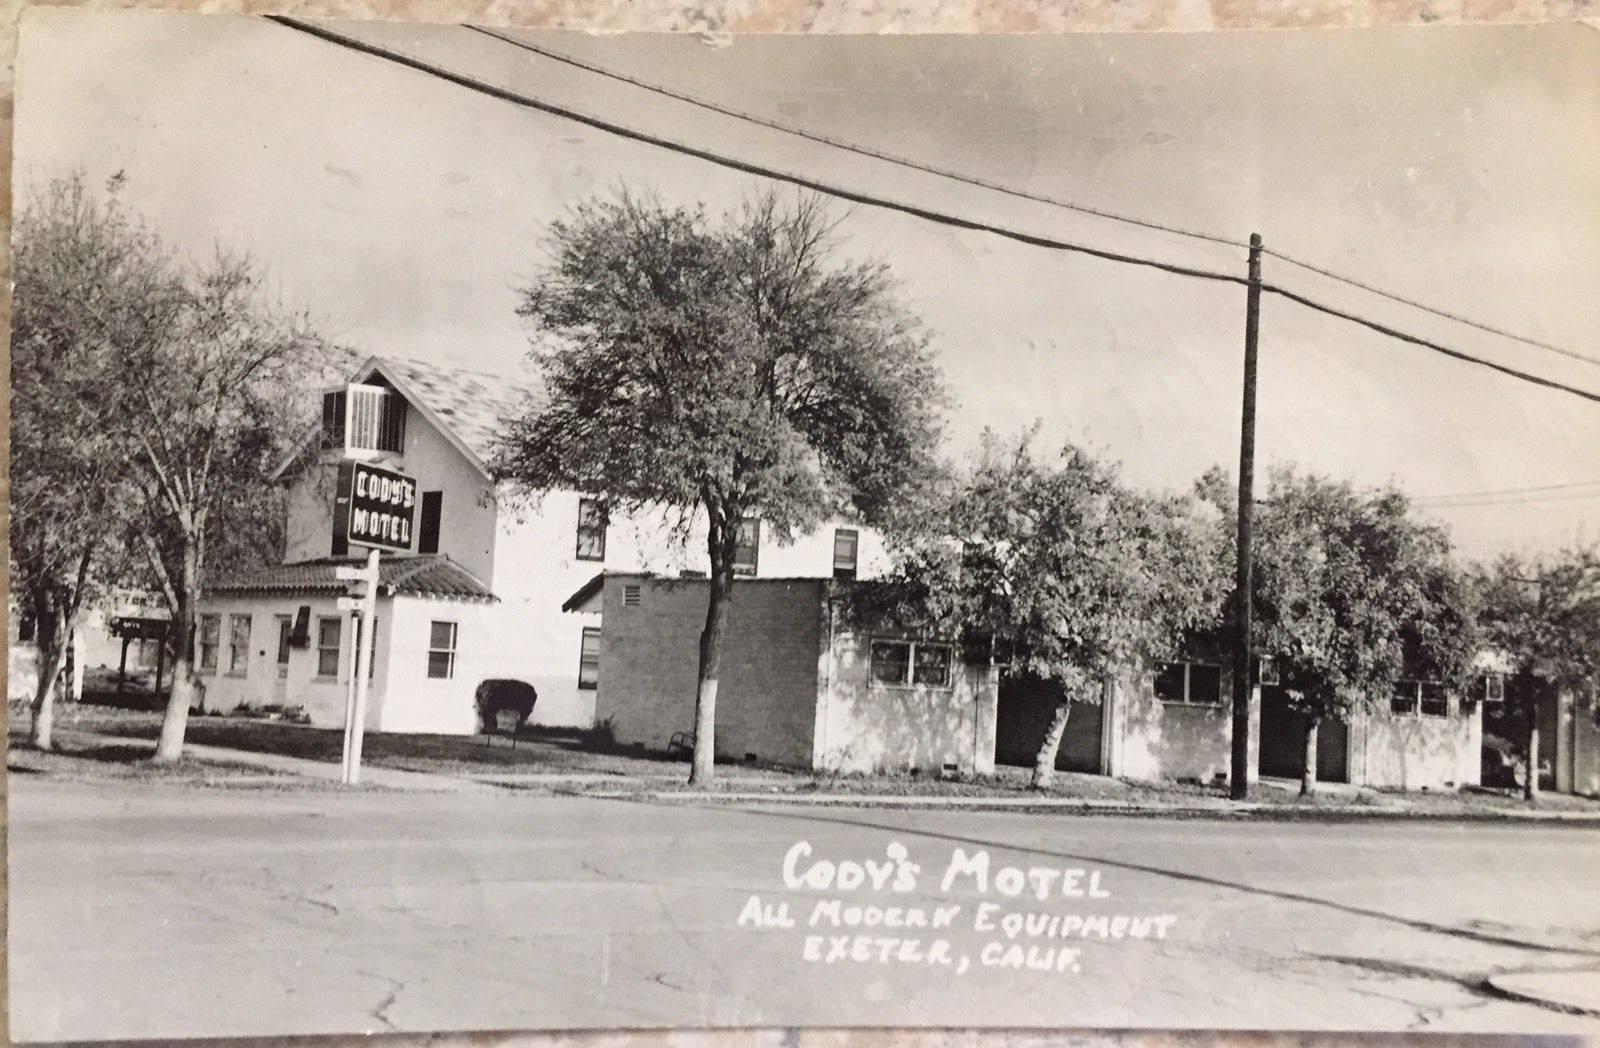 historical exeter-codys motel